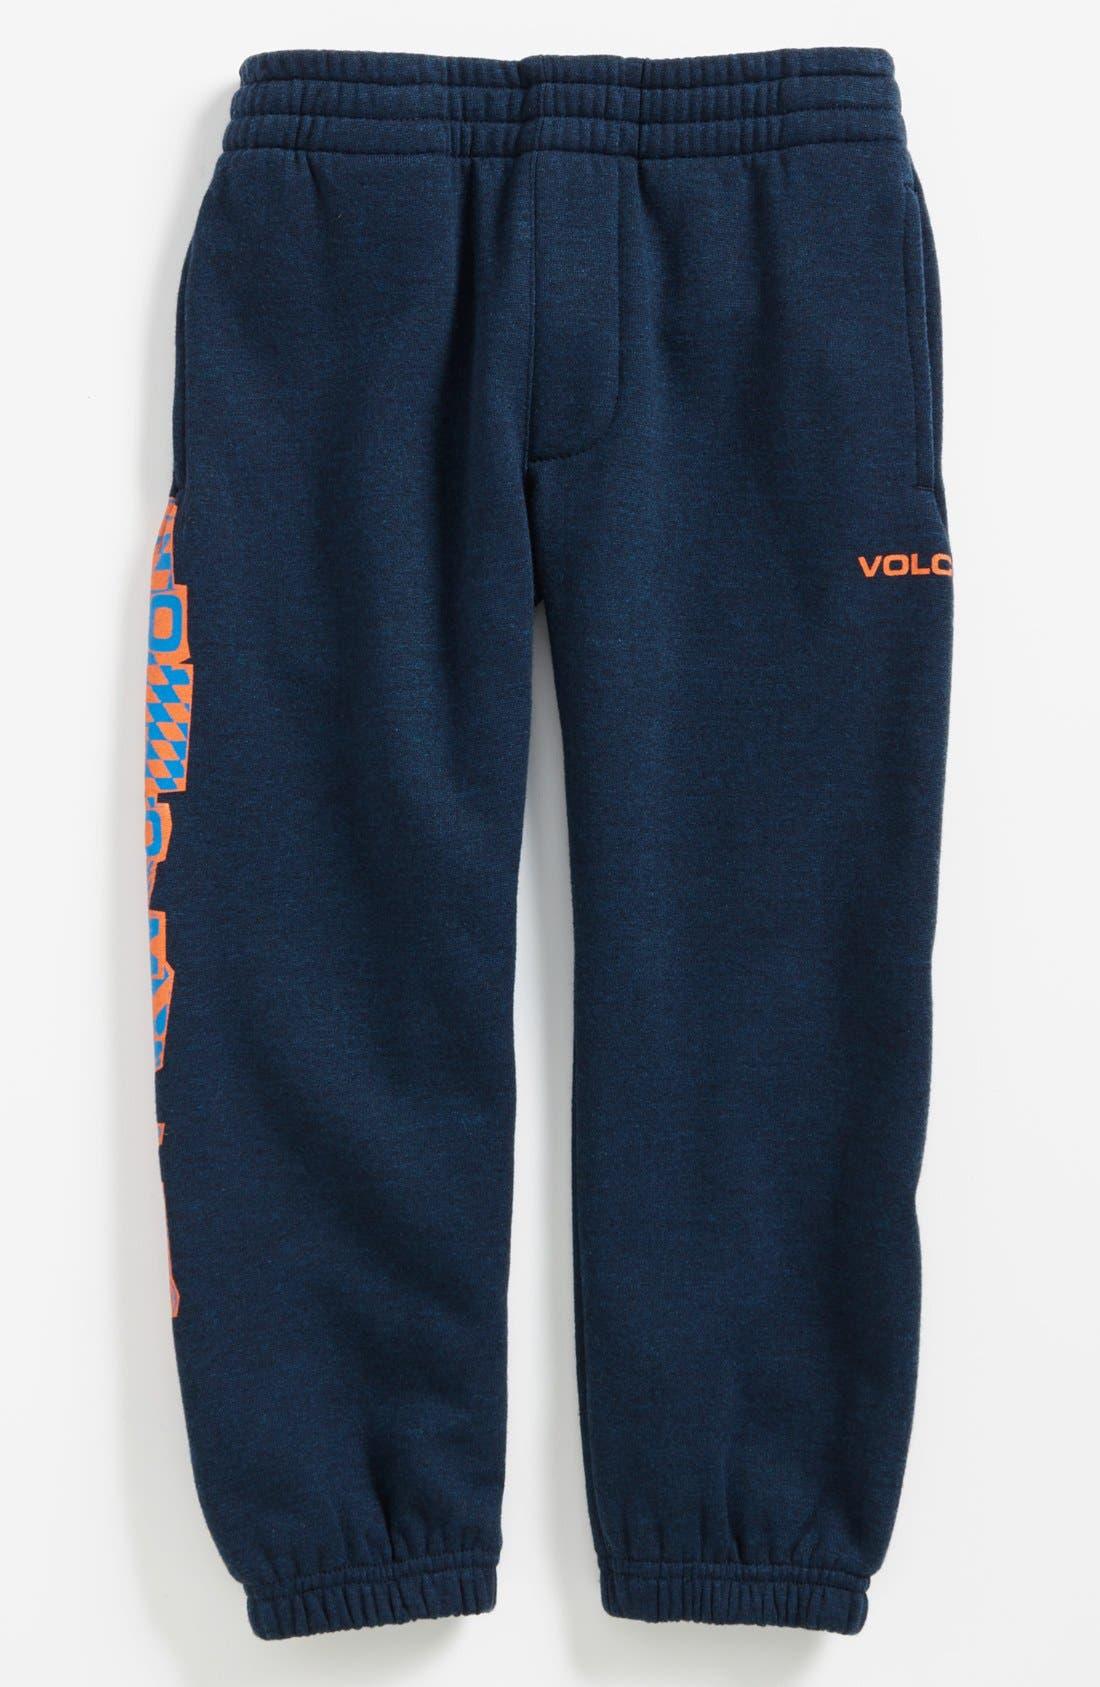 Alternate Image 1 Selected - Volcom 'Gigged' Sweatpants (Little Boys & Big Boys) (Online Only)